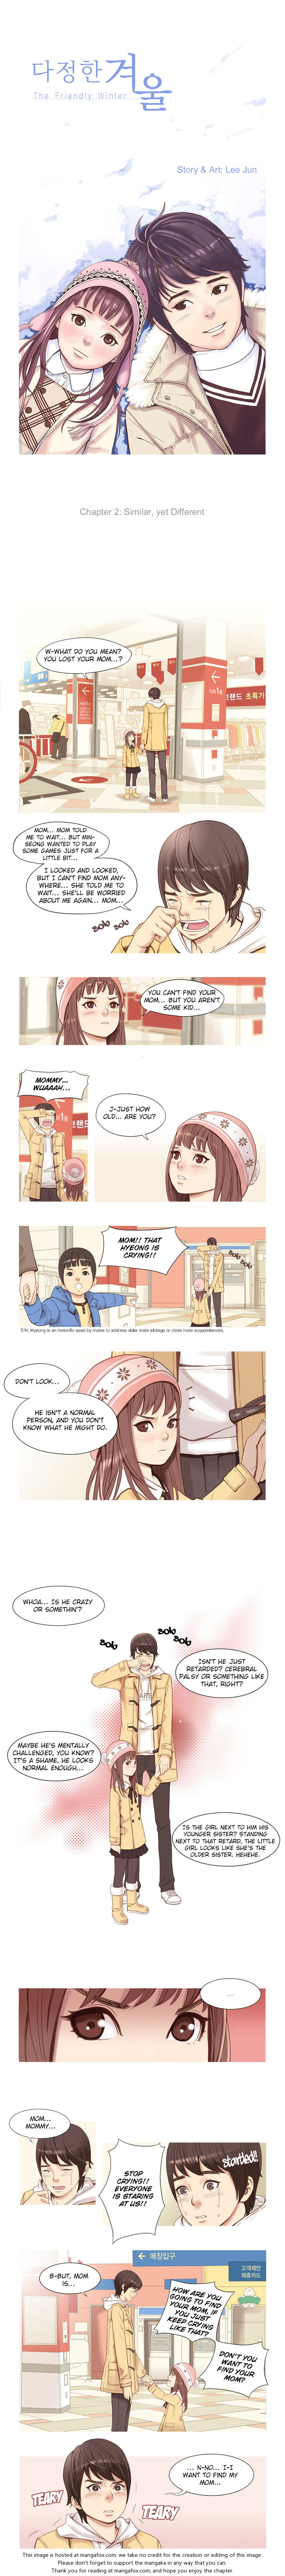 The Friendly Winter 2: Similar, Yet Different at MangaFox.la